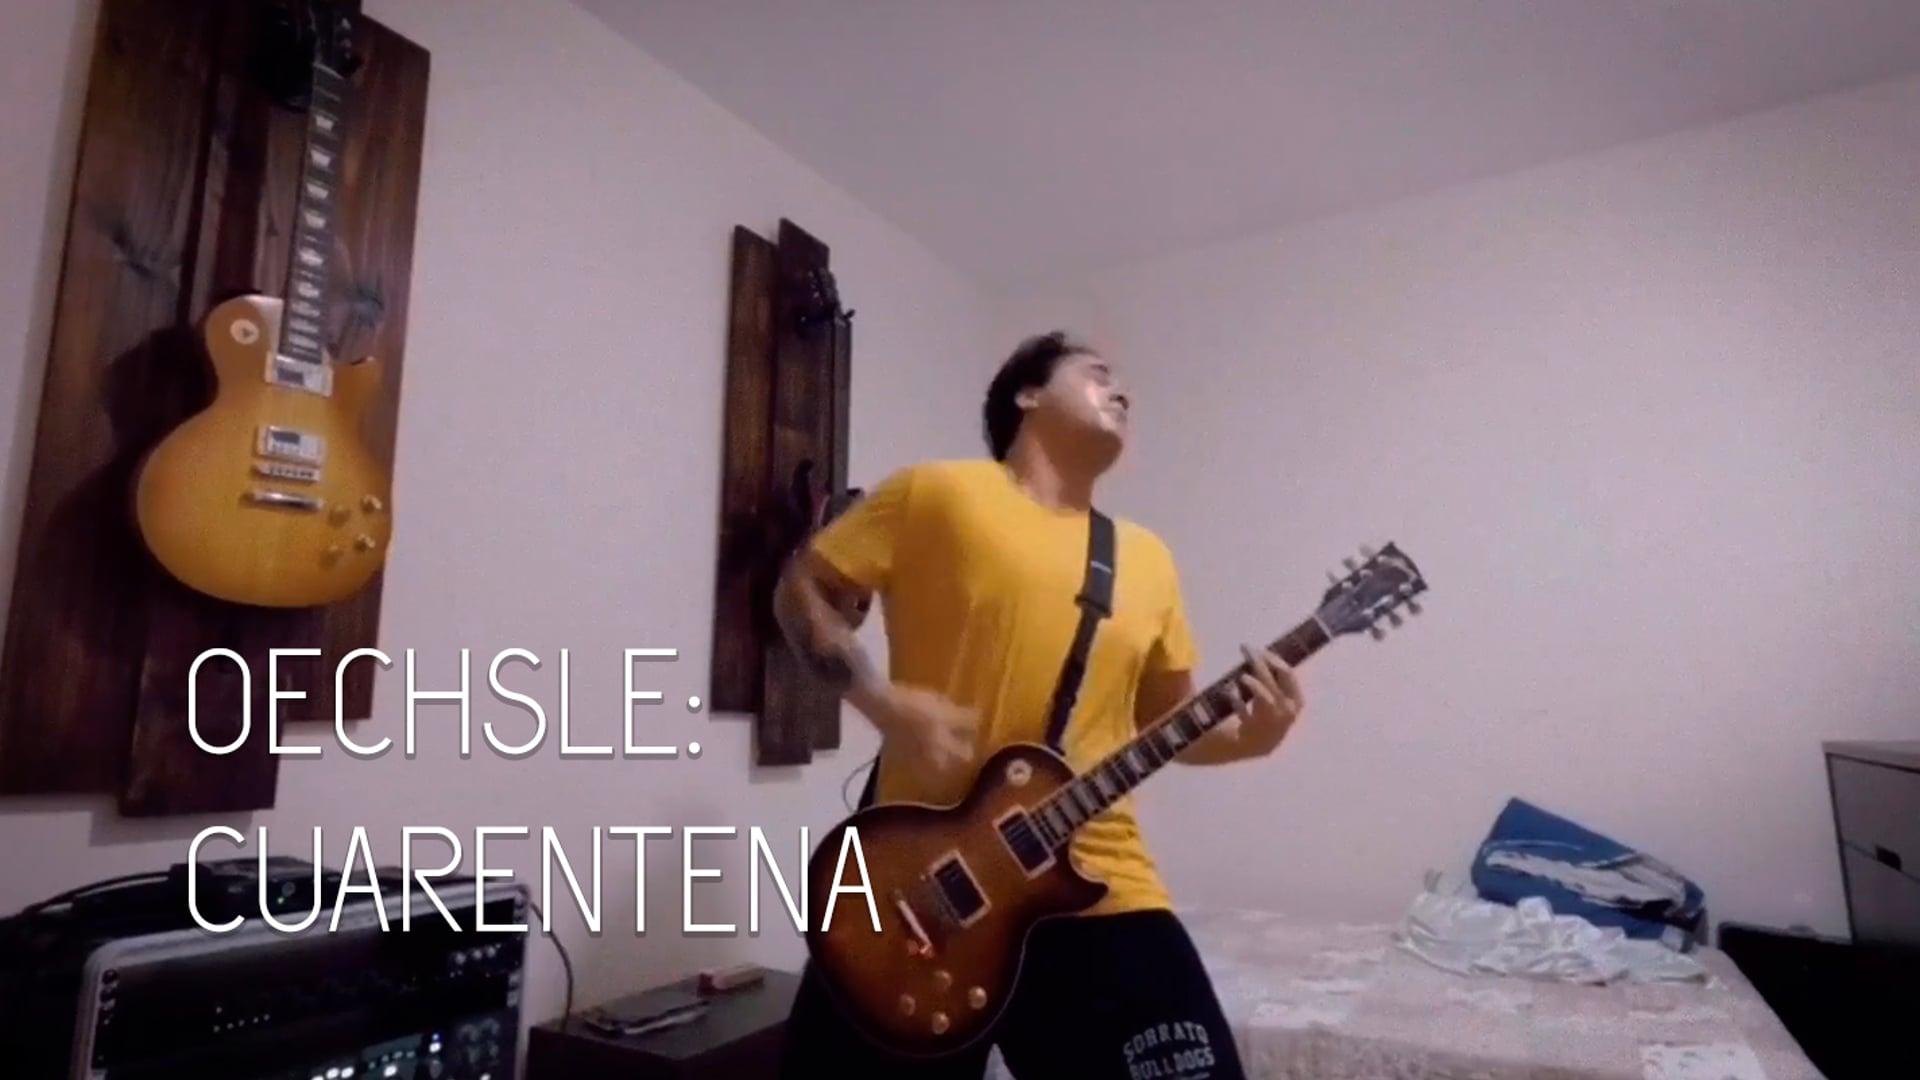 Oechsle Cuarentena